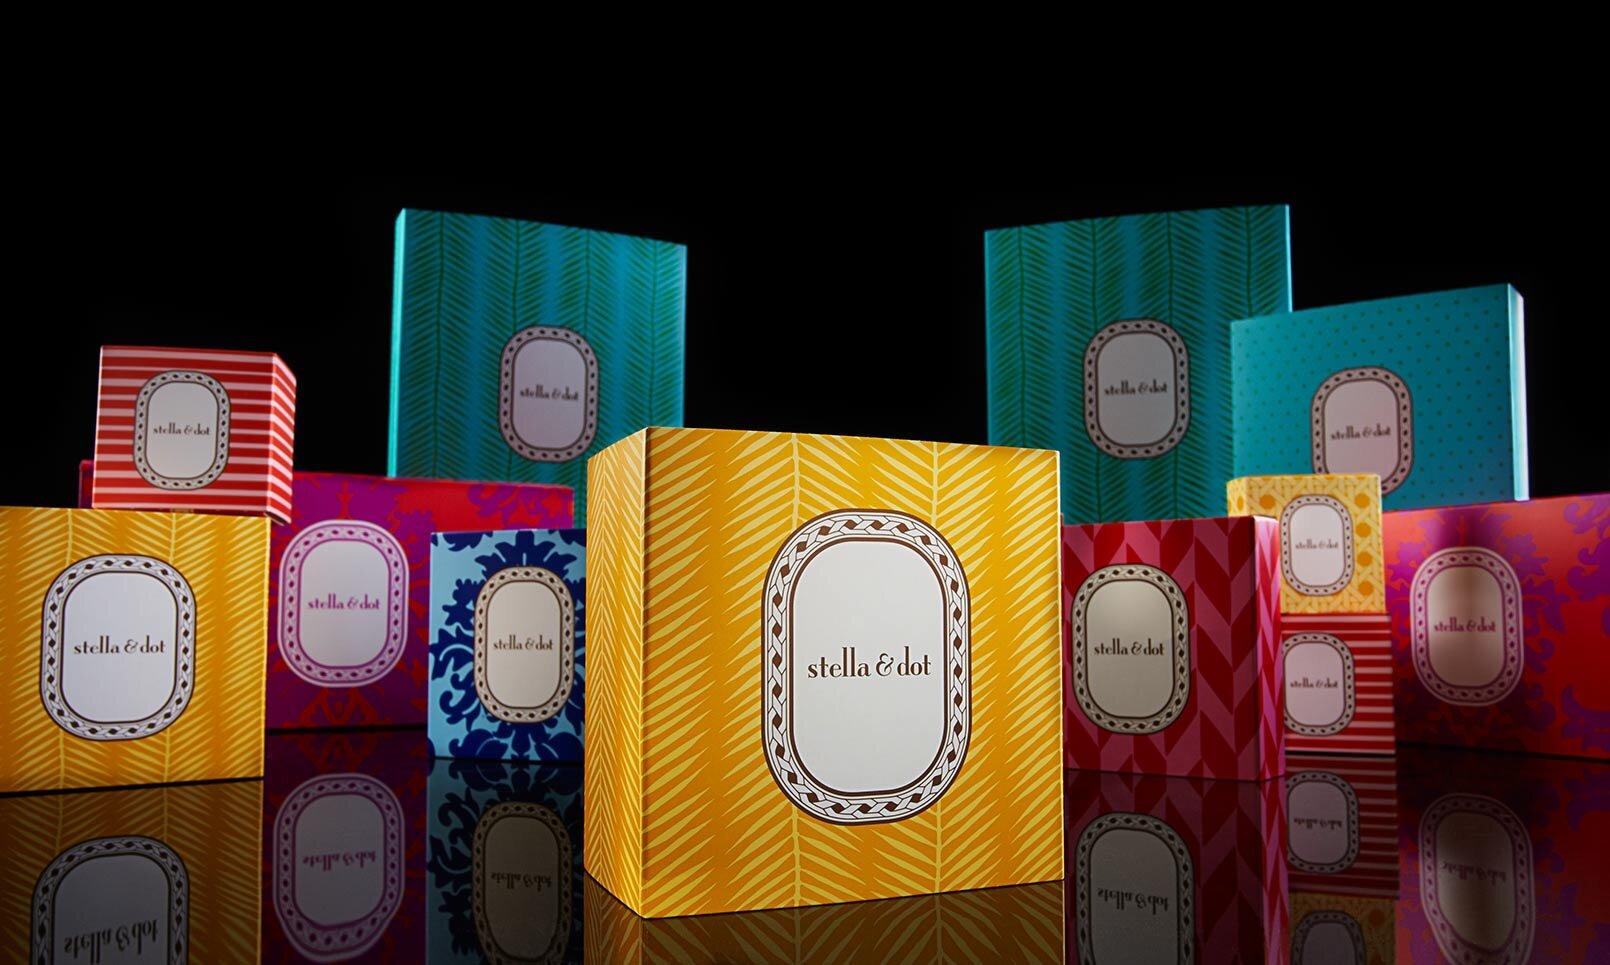 Stella-and-dot-jewelry-box-design-packaging-company-3.jpg